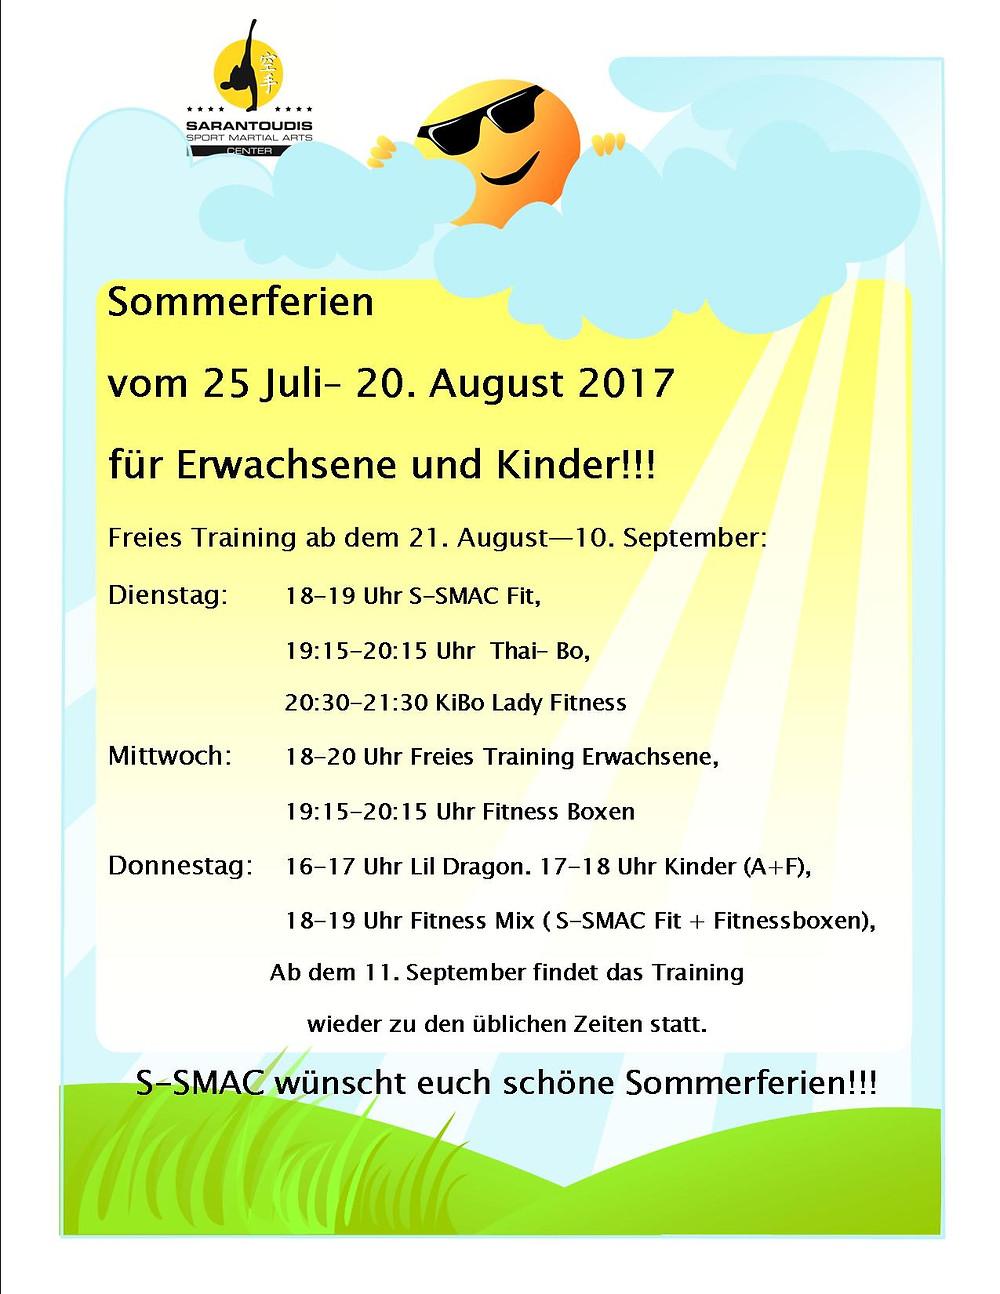 SSMAC Sommerferien